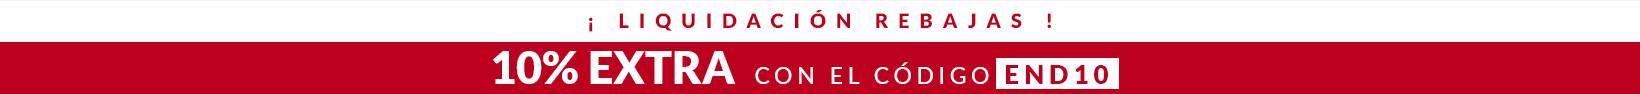 liquidacion_reajas21_barrita_Es.jpg